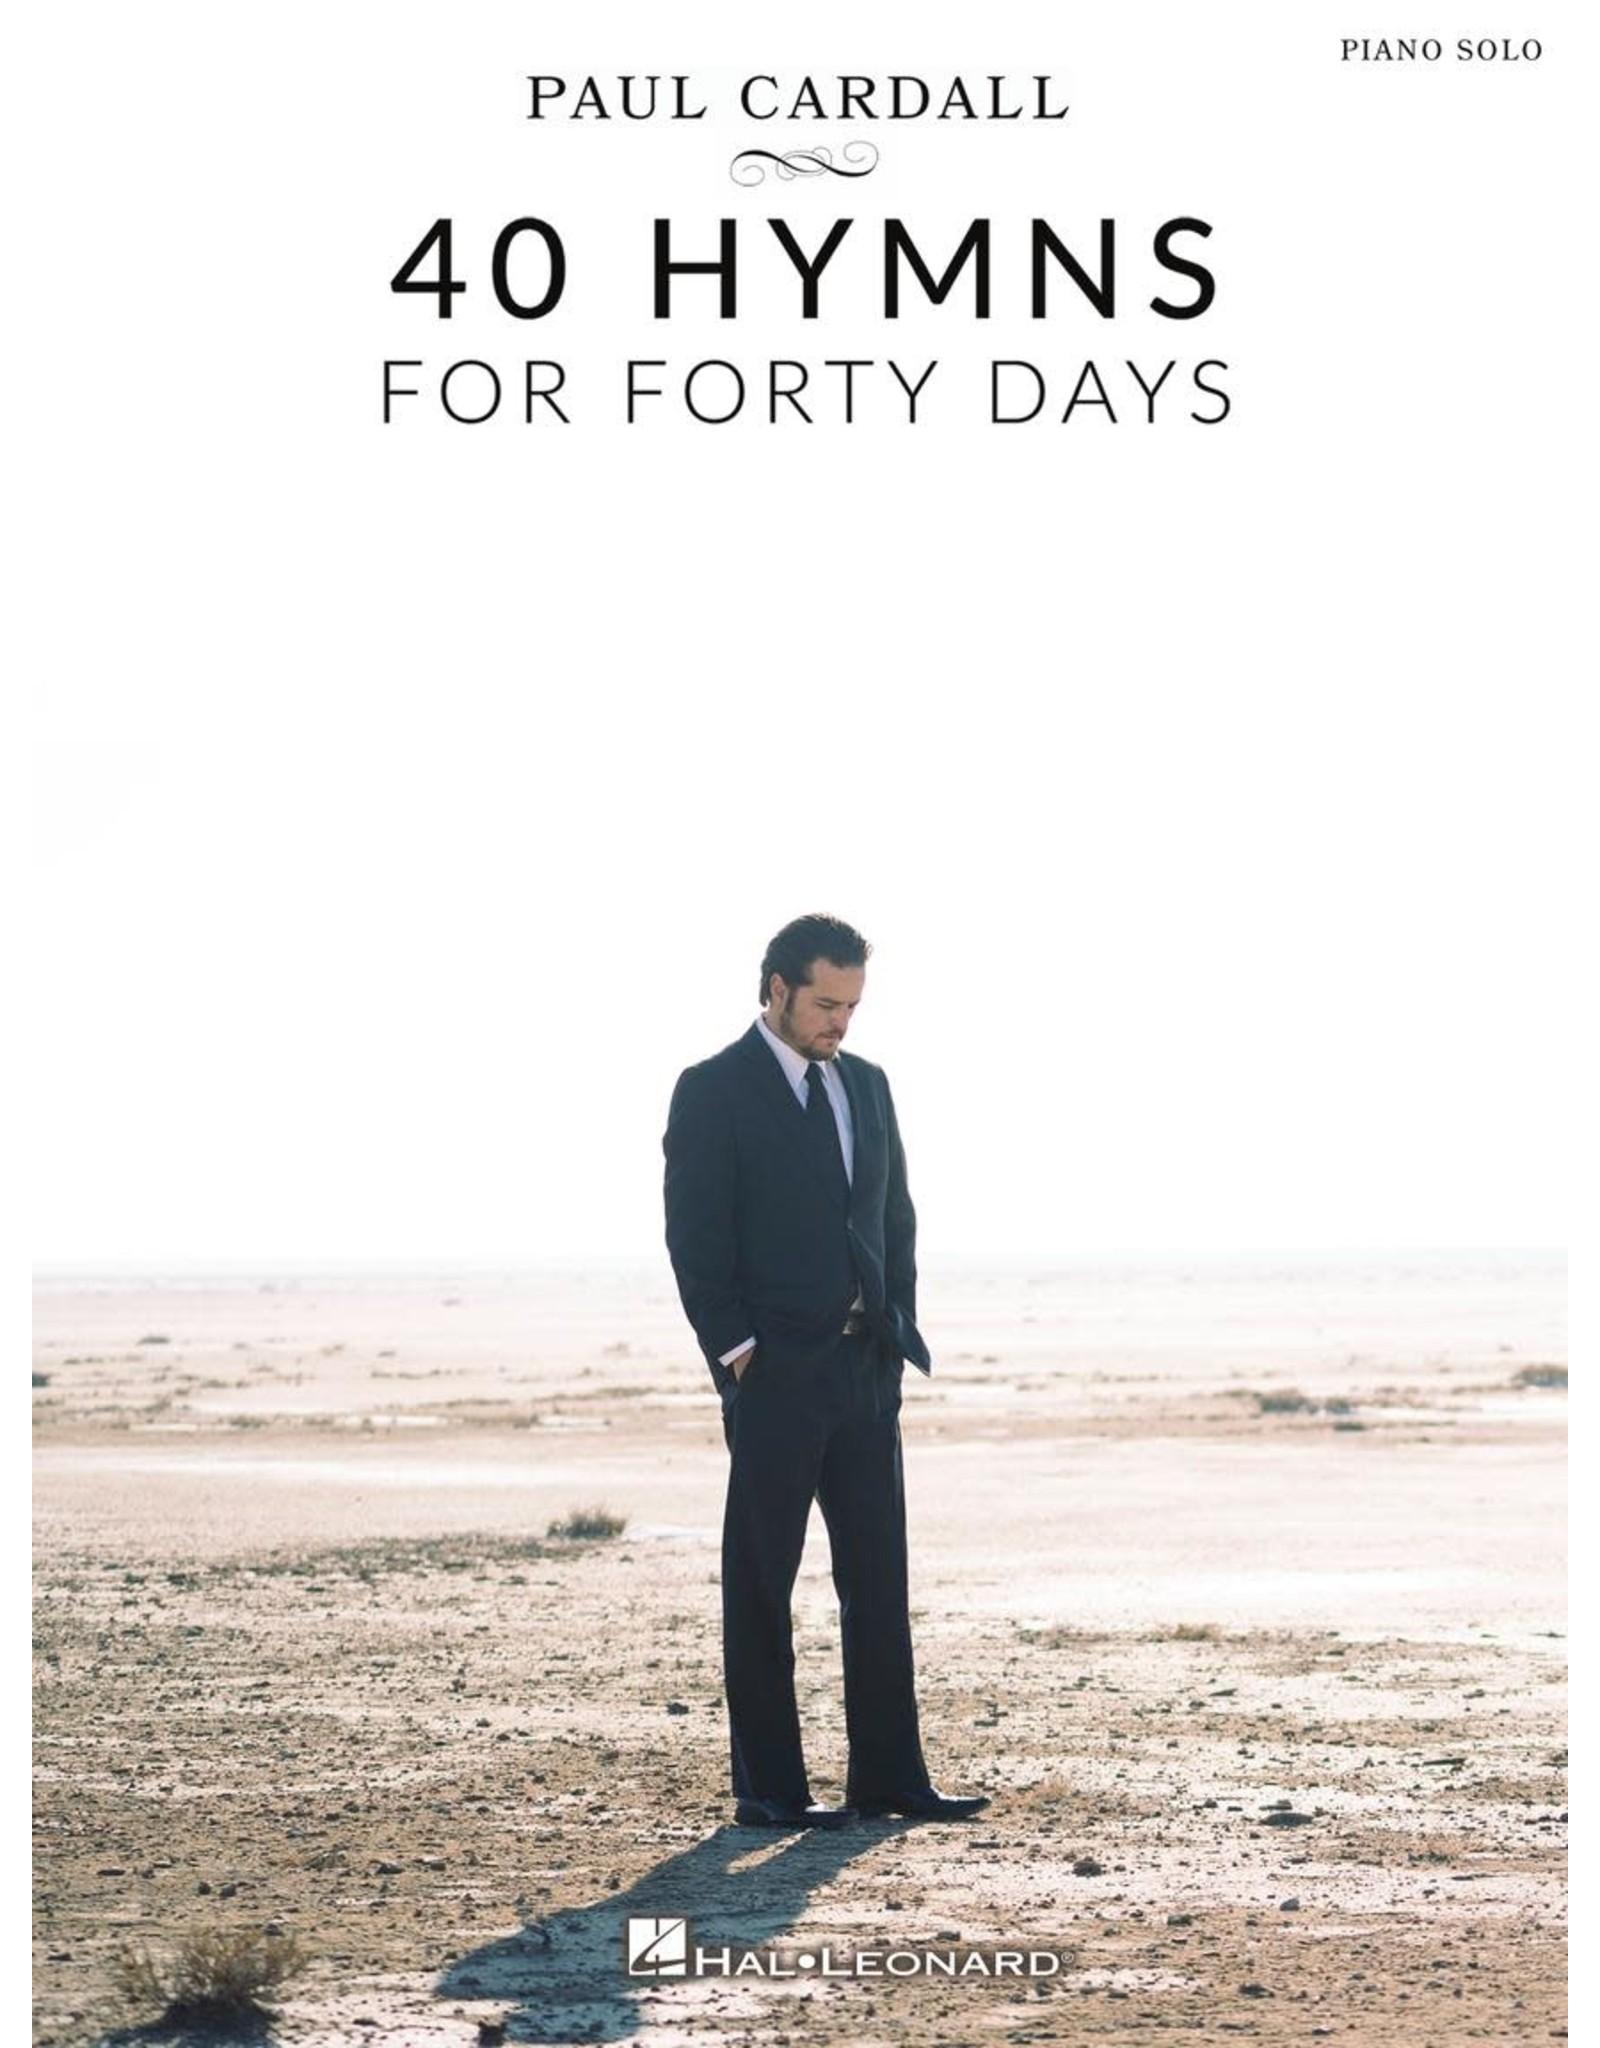 Hal Leonard Paul Cardall - 40 Hymns for Forty Days